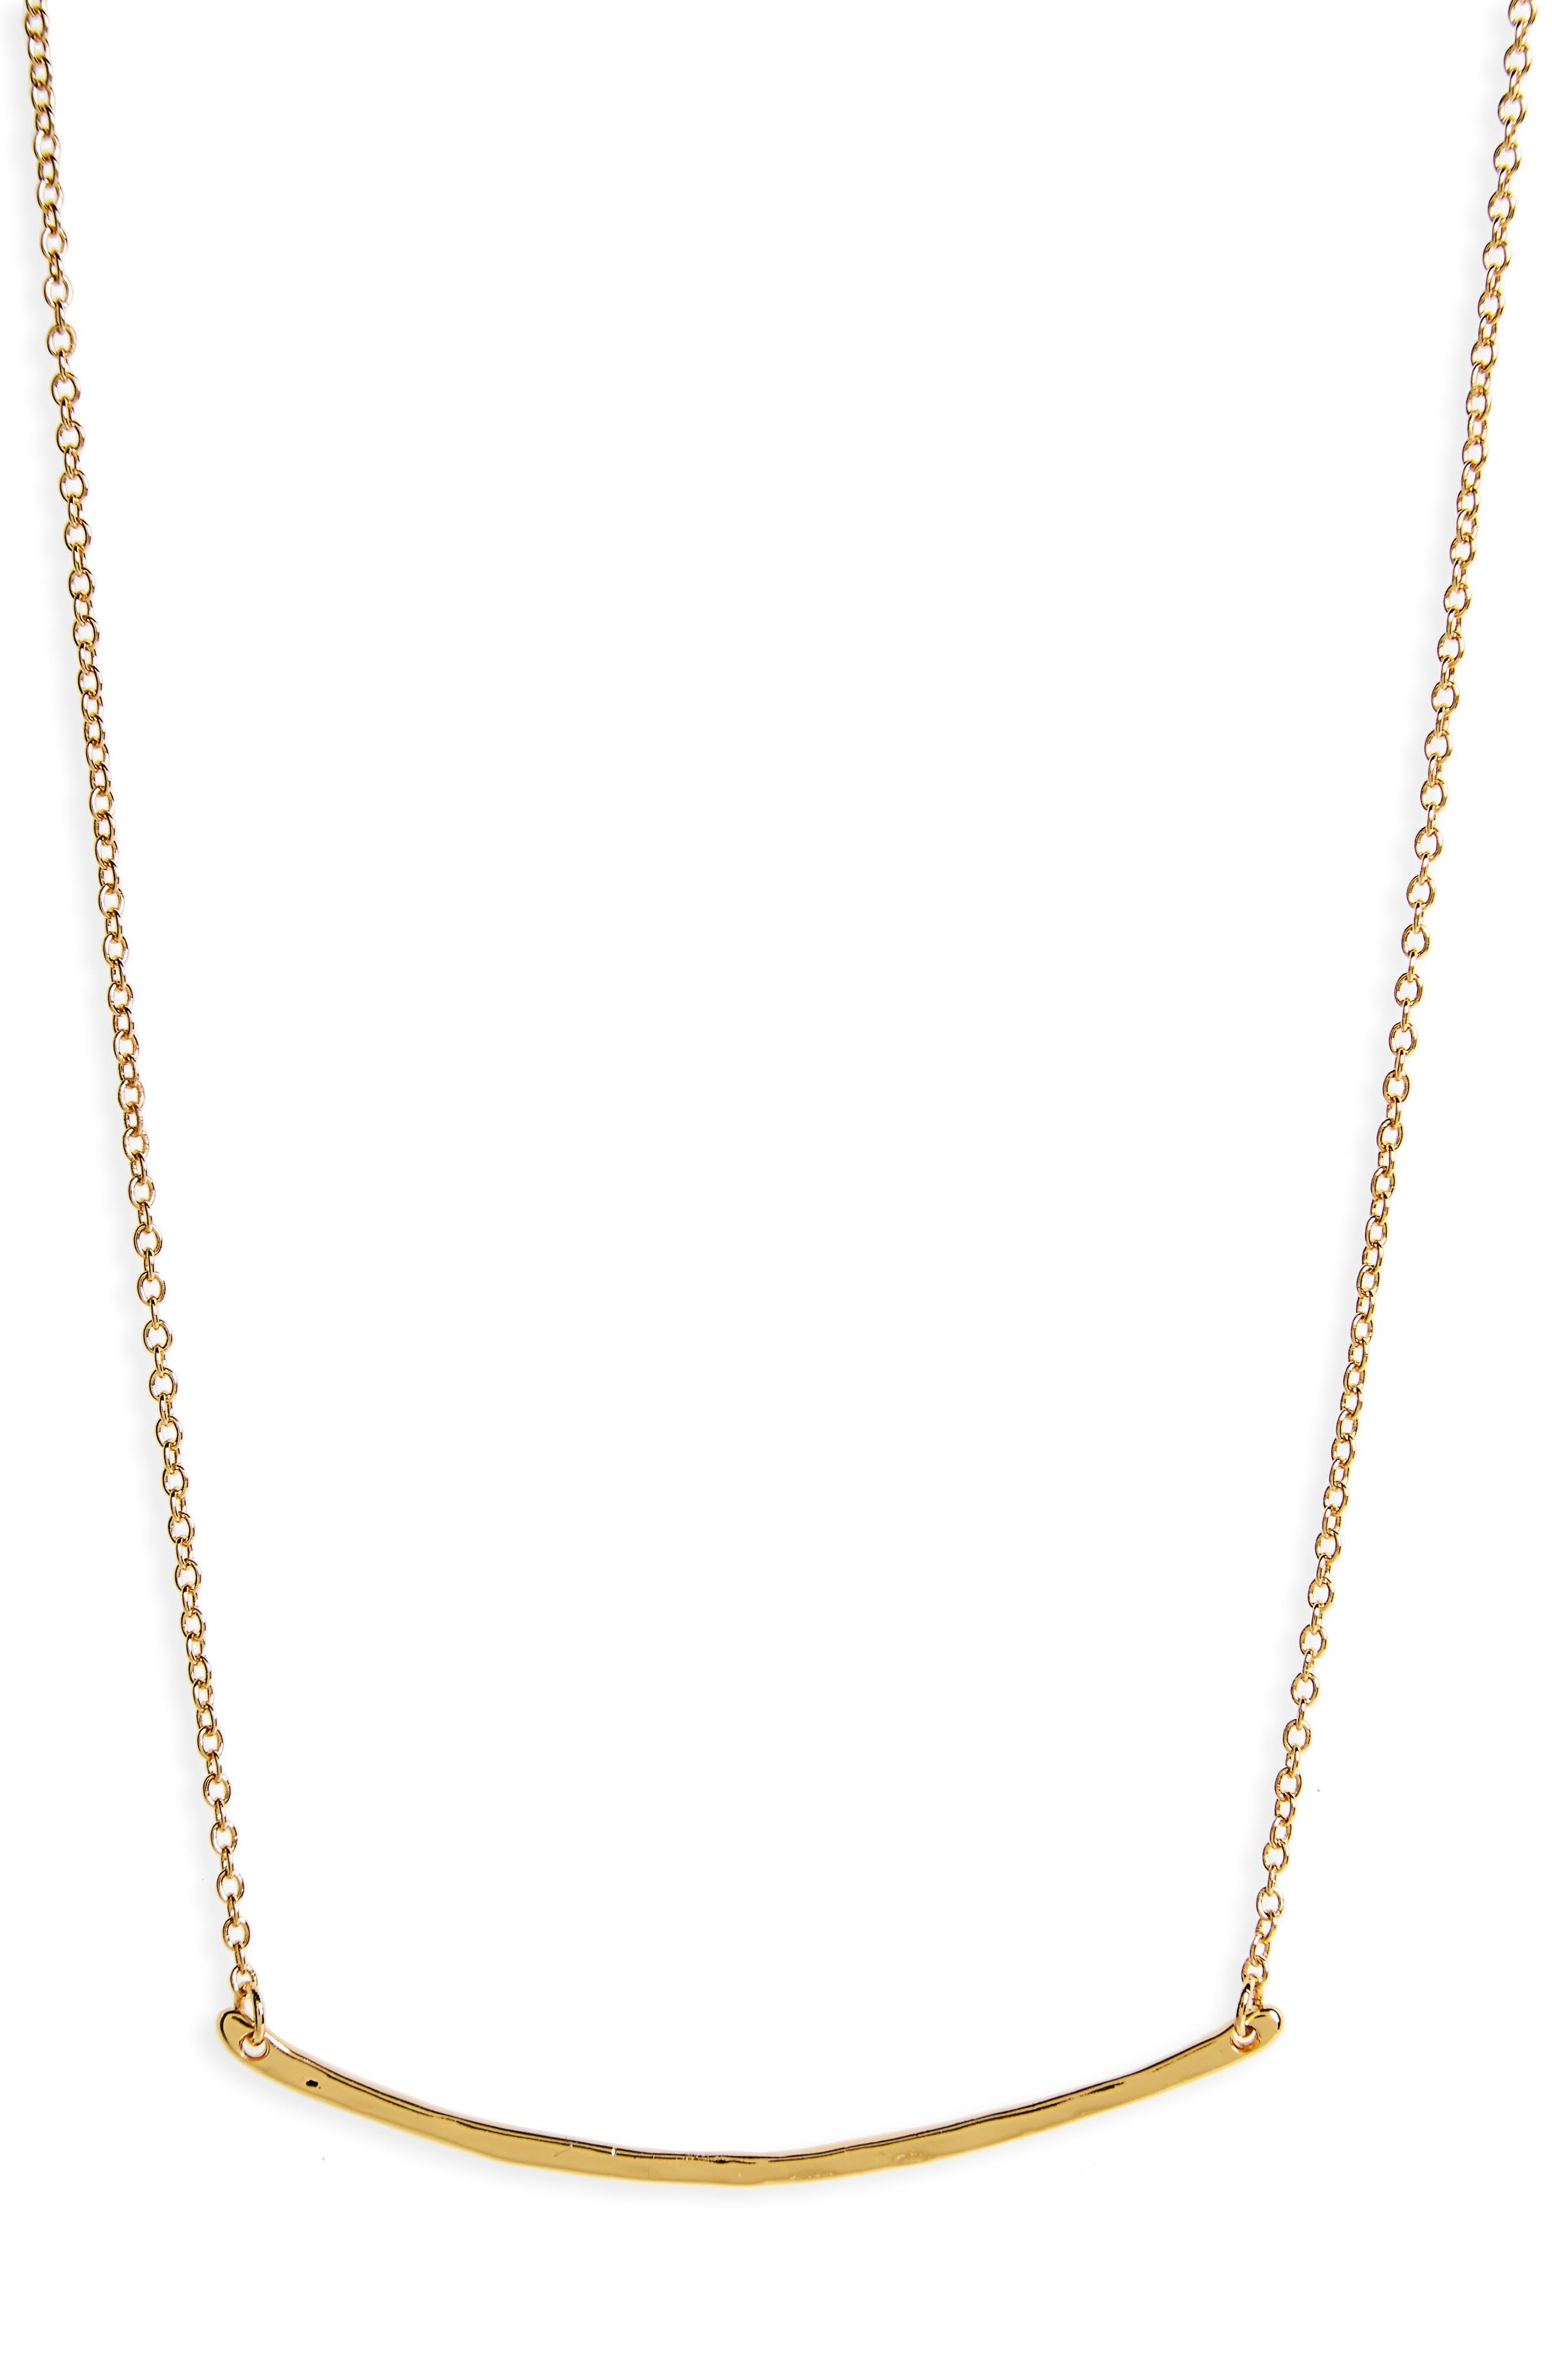 Alternate Image 1 Selected - gorjana Taner Bar Small Necklace